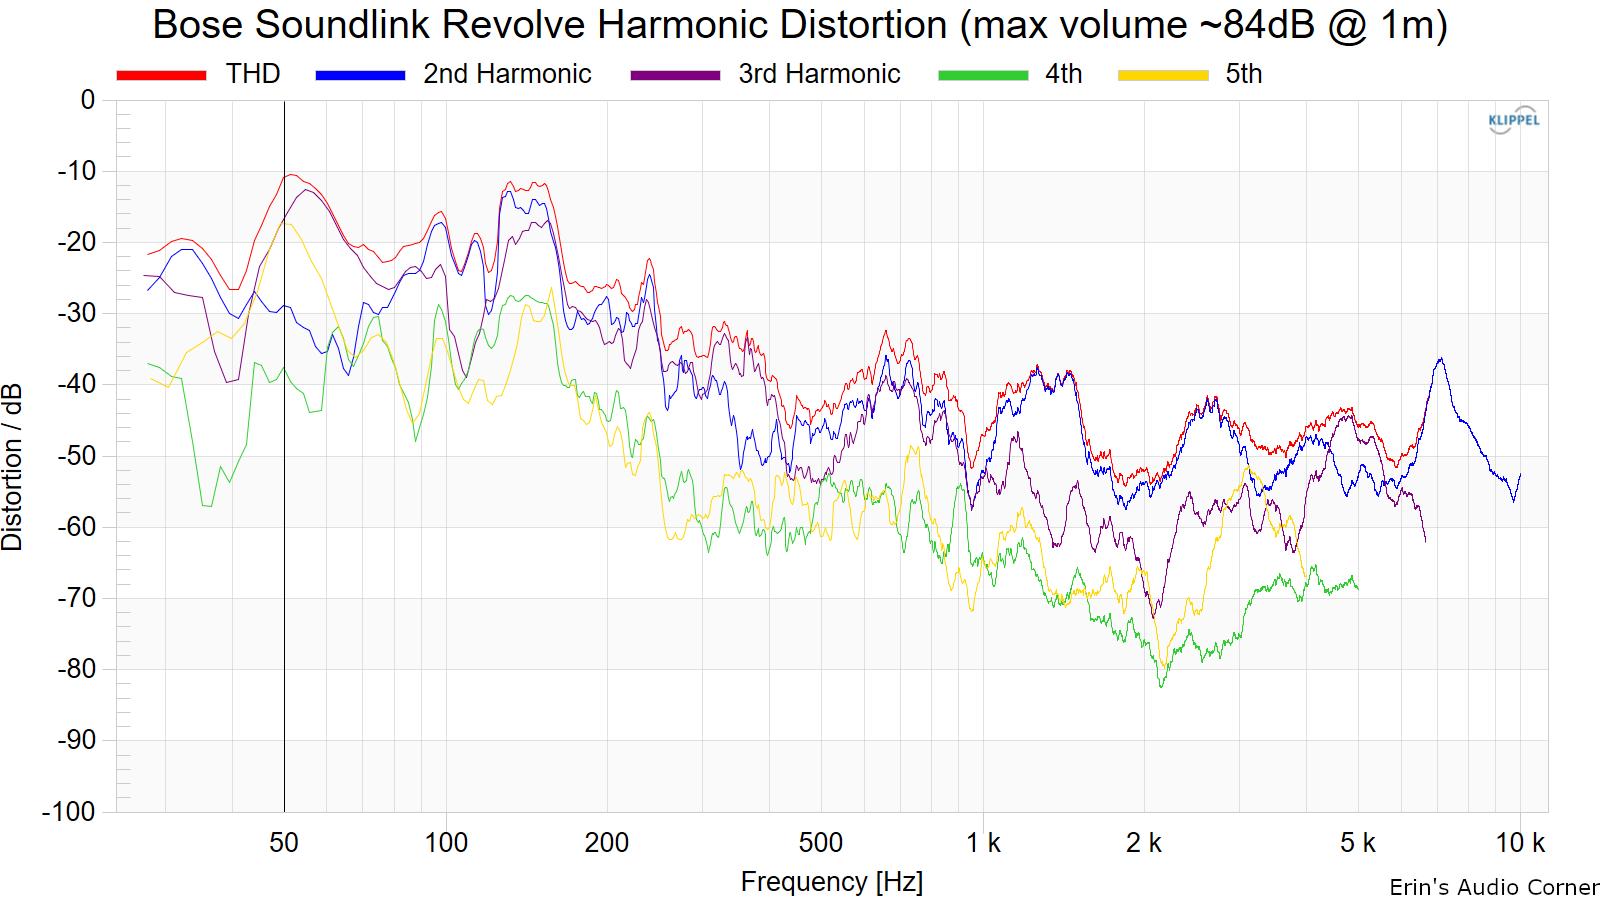 Bose%20SoundLink%20Revolve%20Harmonic%20Distortion%20%28max%20volume%20~84dB%20%40%201m%29.png